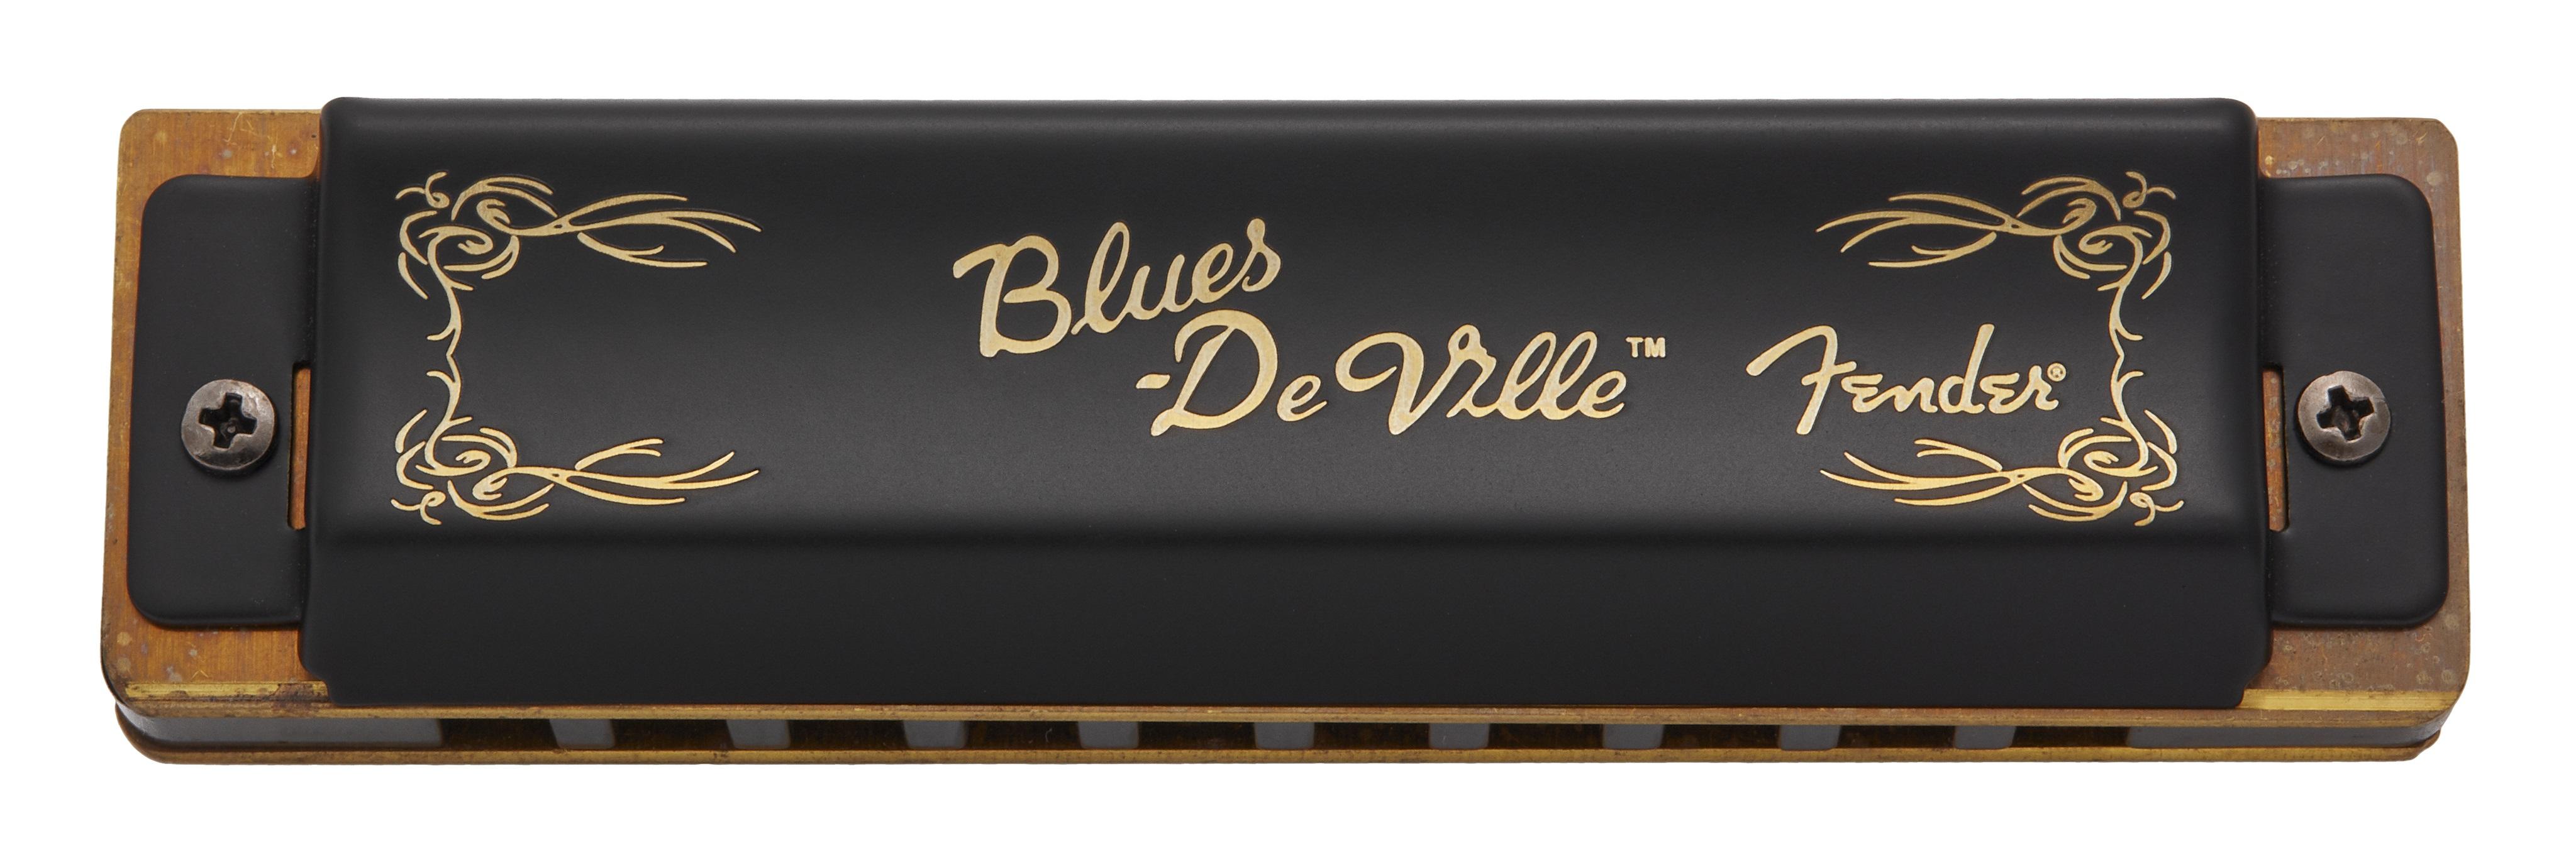 Fender Blues DeVille Key of A